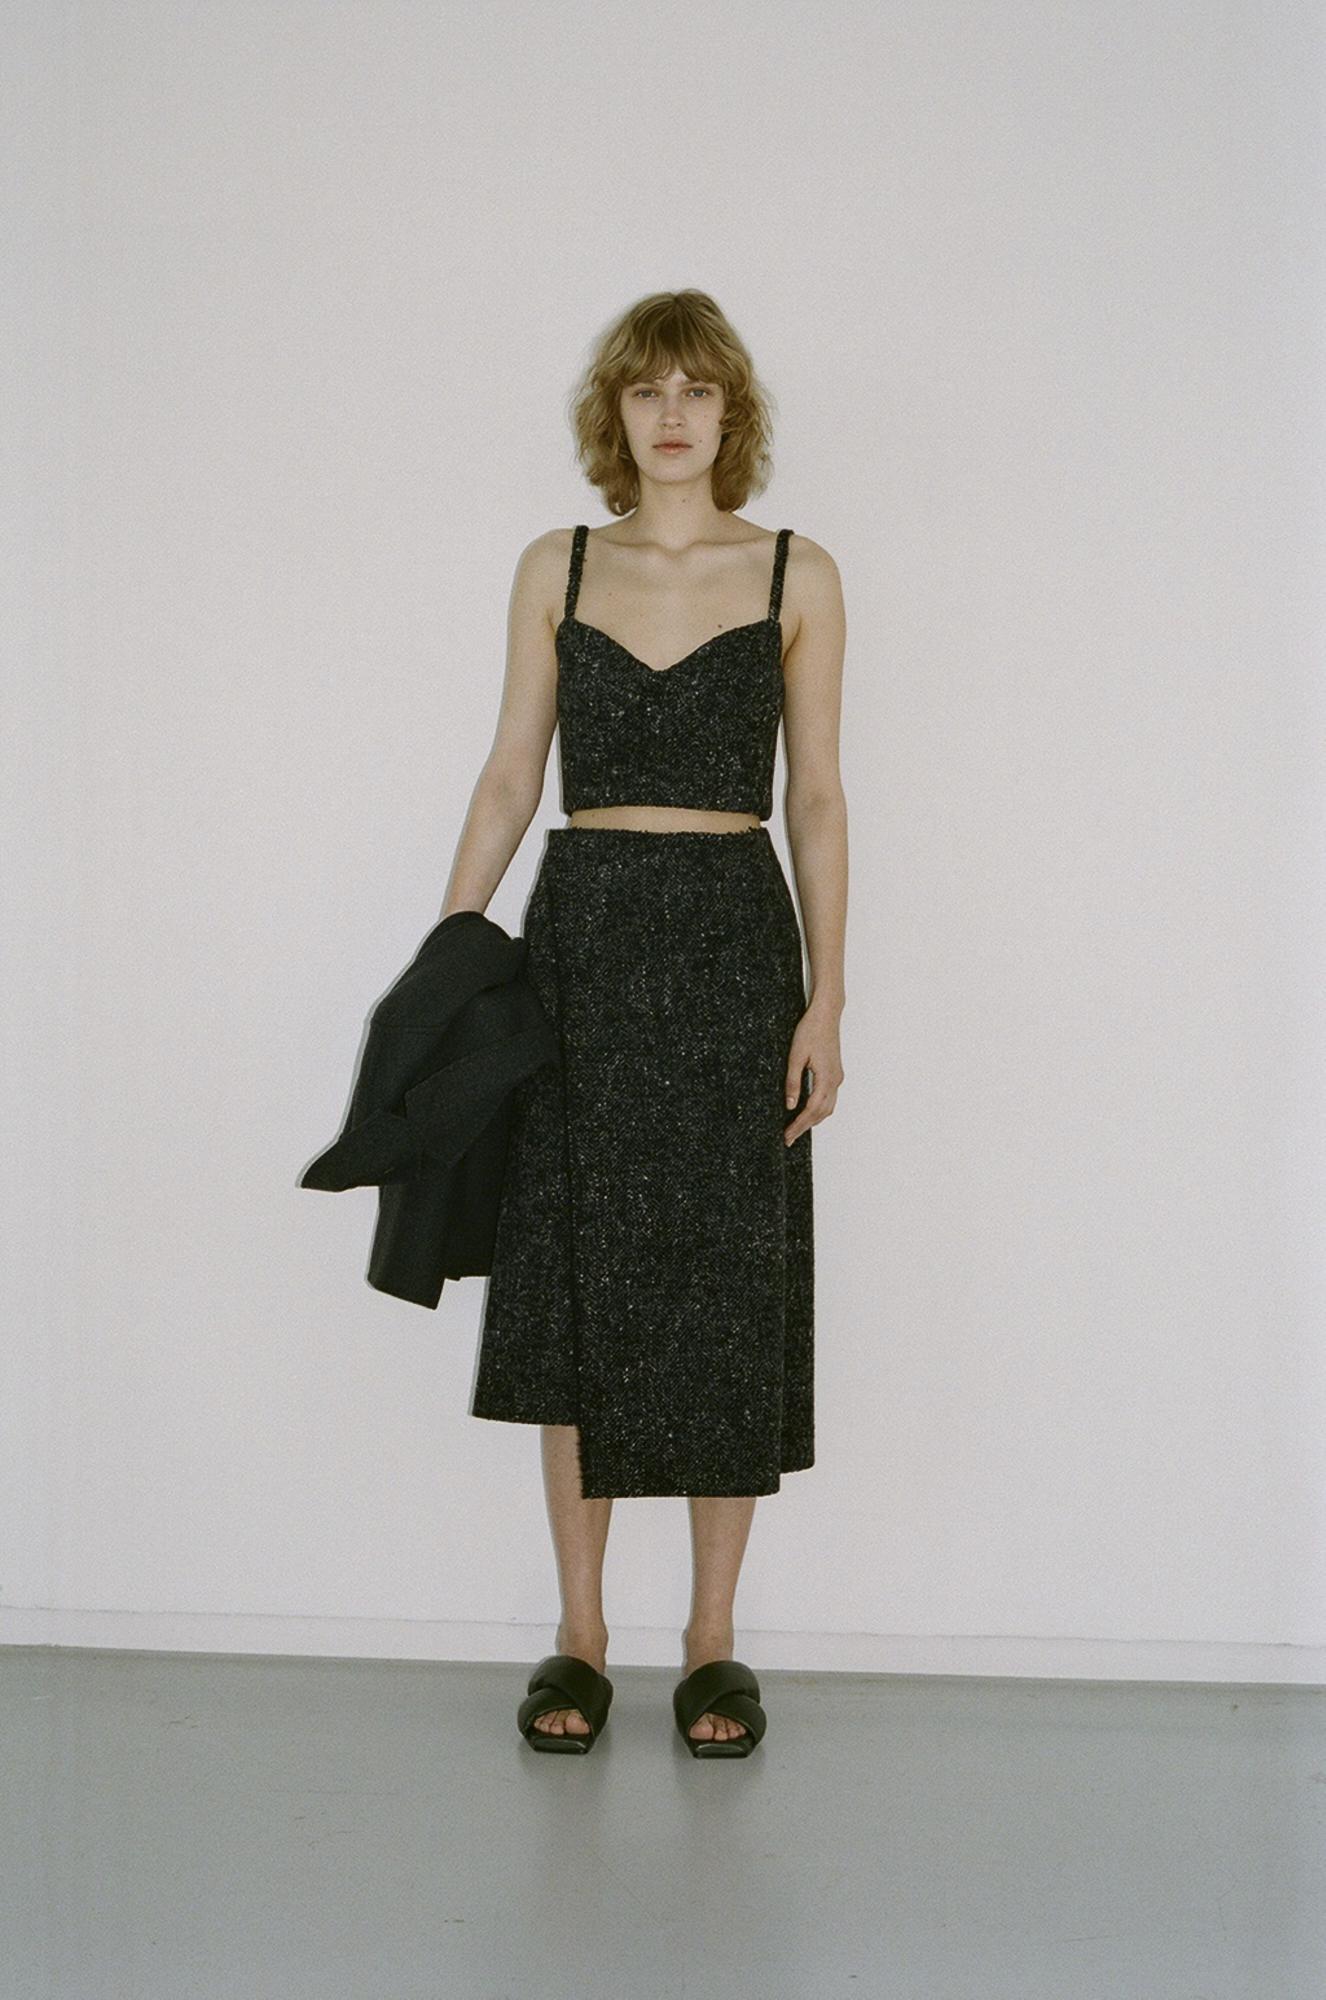 GAUCHERE Fall Winter 2021 Paris Fashion Week LOOK 15 Jacket TIA, Top TAMIKO, Skirt TECA, Shoes DOUBLE X